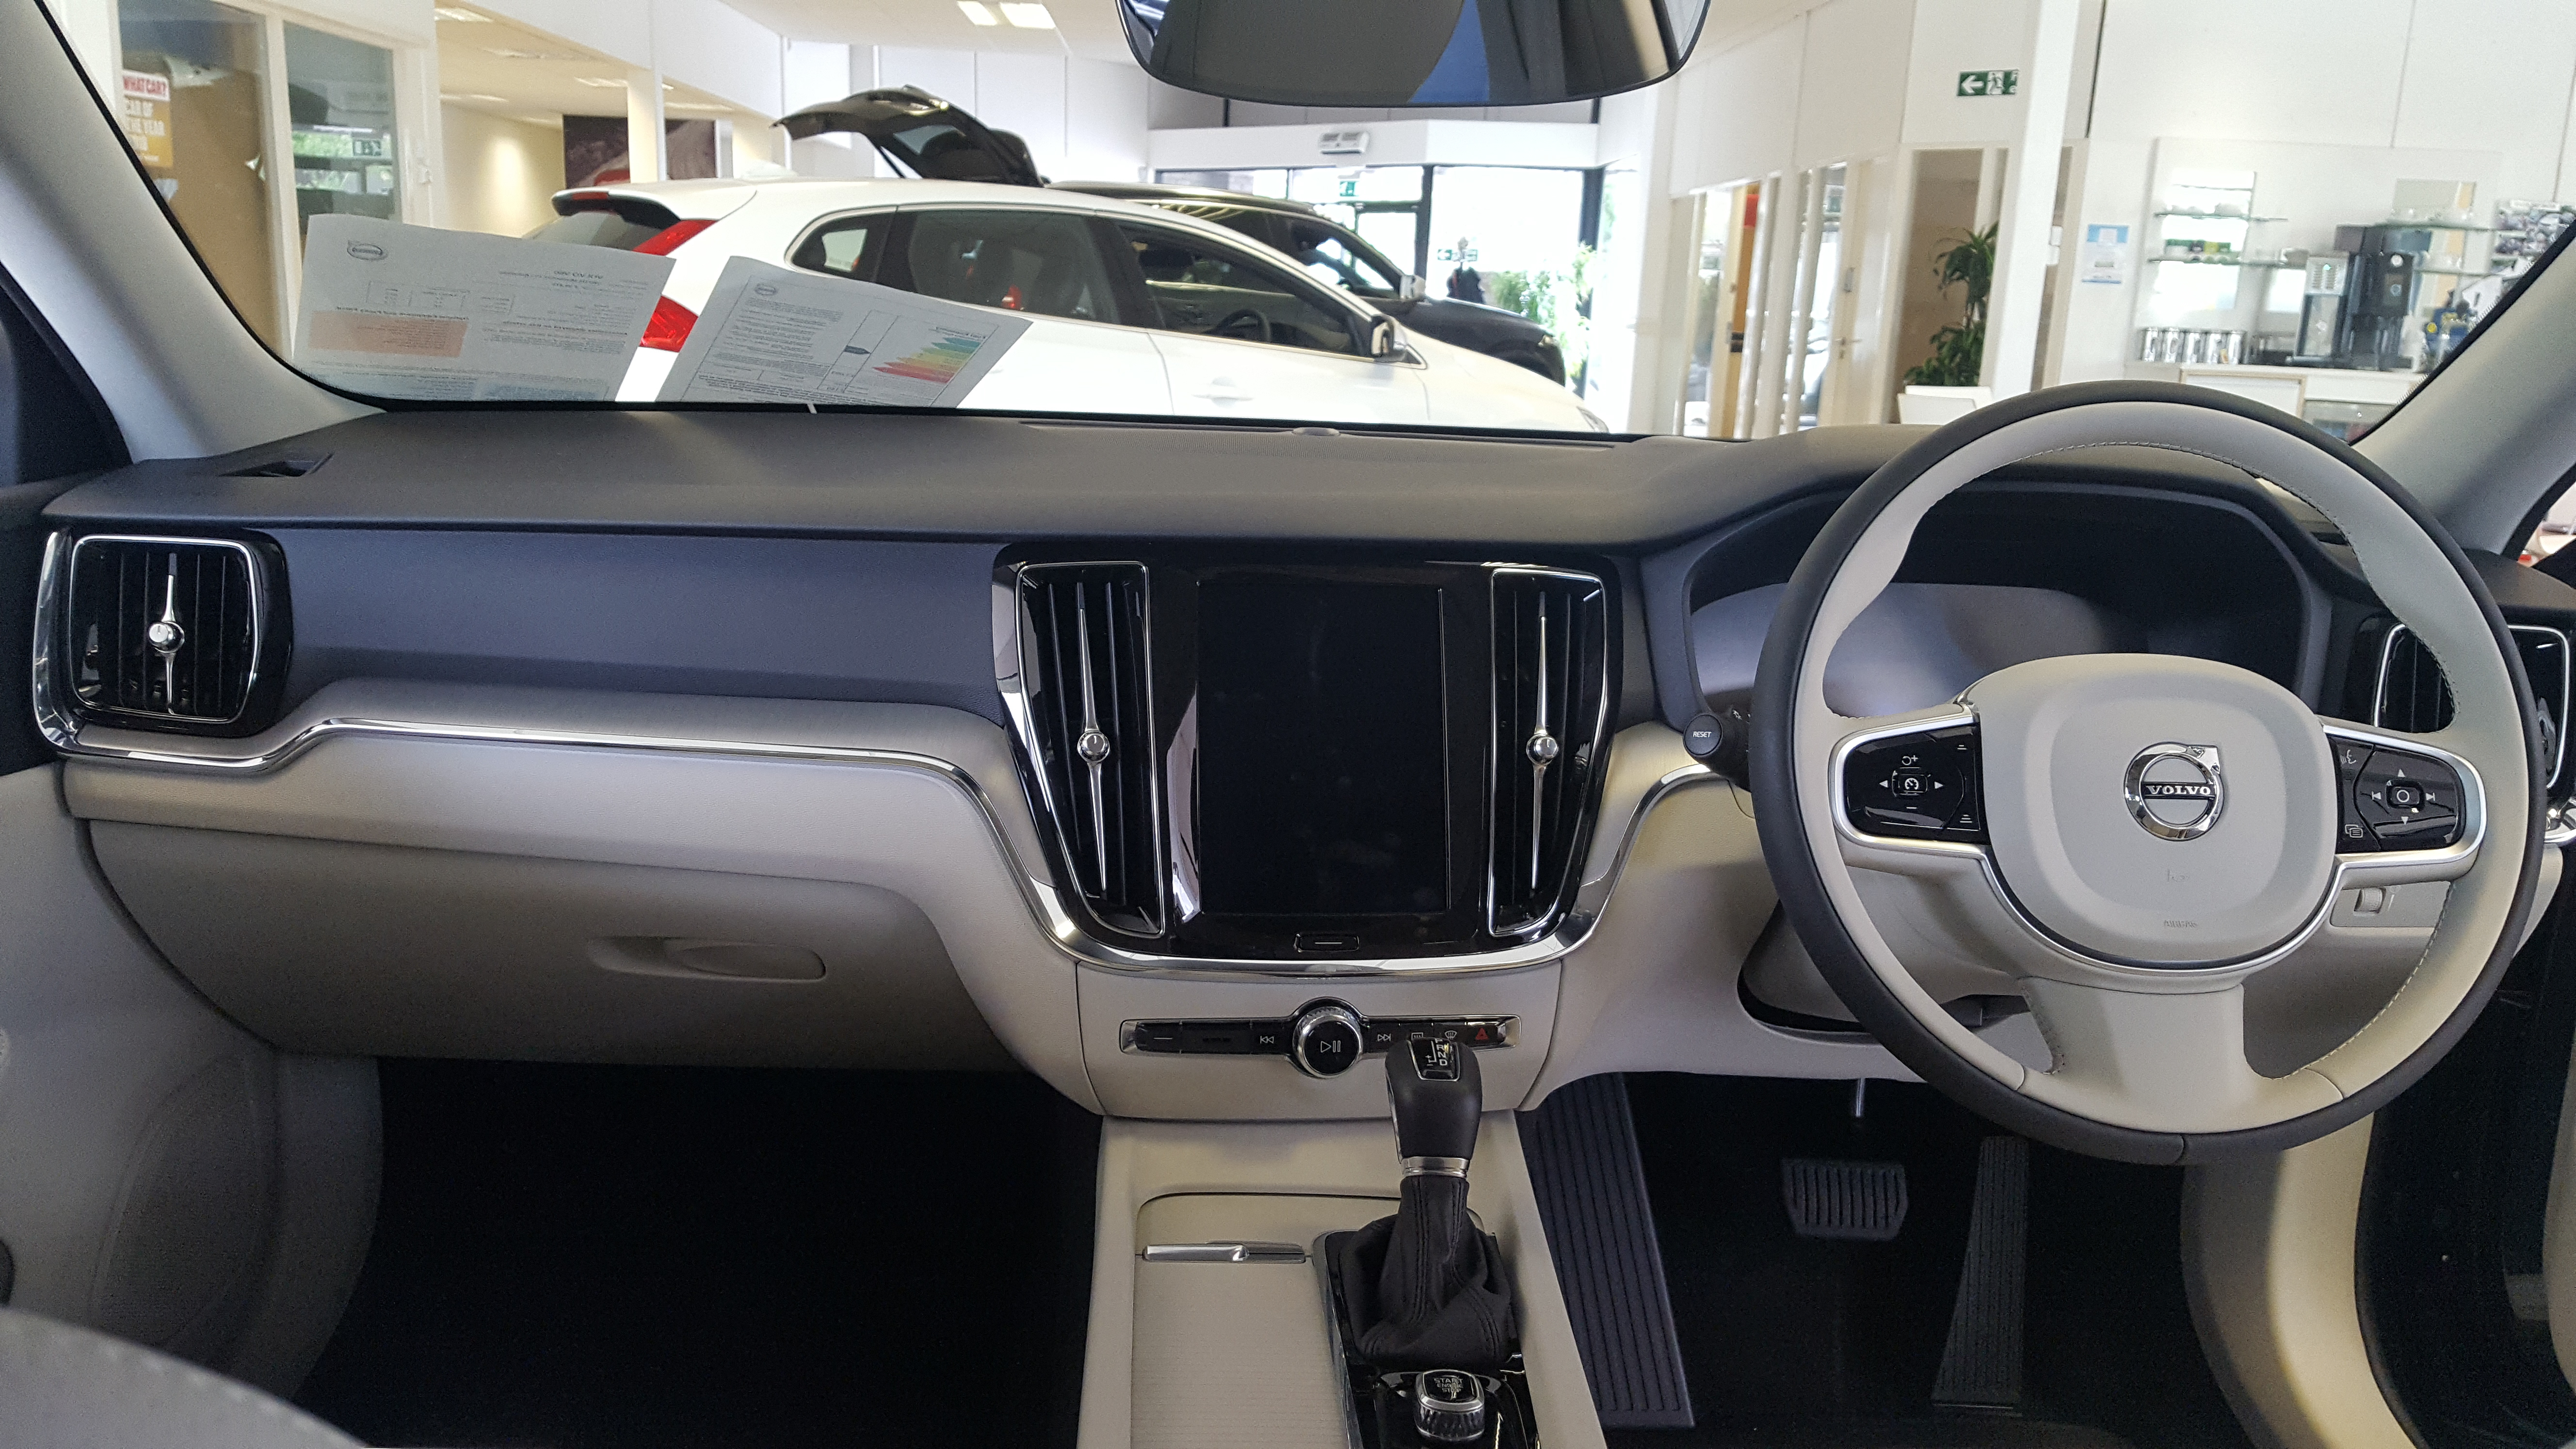 File:2018 Volvo V60 Interior.jpg - Wikimedia Commons